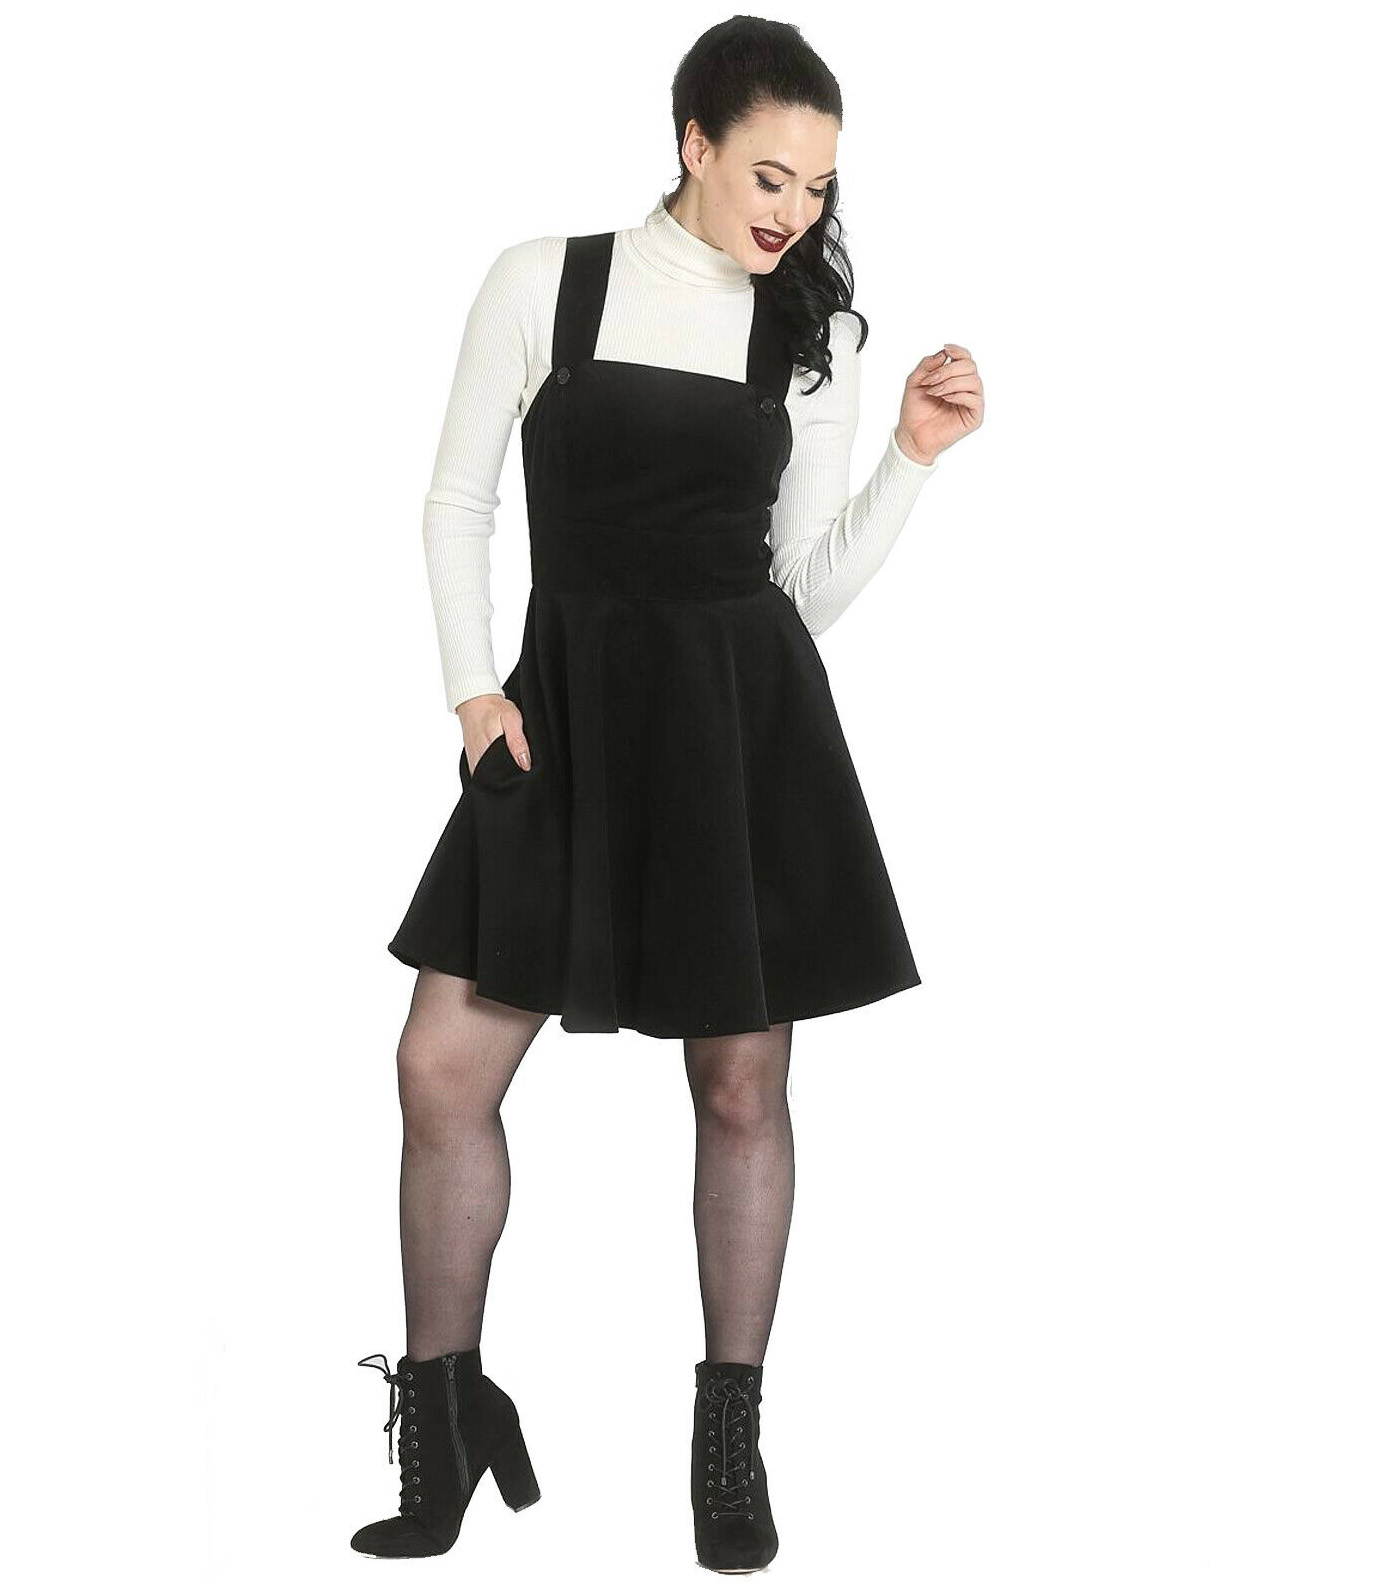 Hell-Bunny-Rockabilly-Corduroy-Mini-Dress-WONDER-YEARS-Pinafore-Black-All-Sizes thumbnail 7